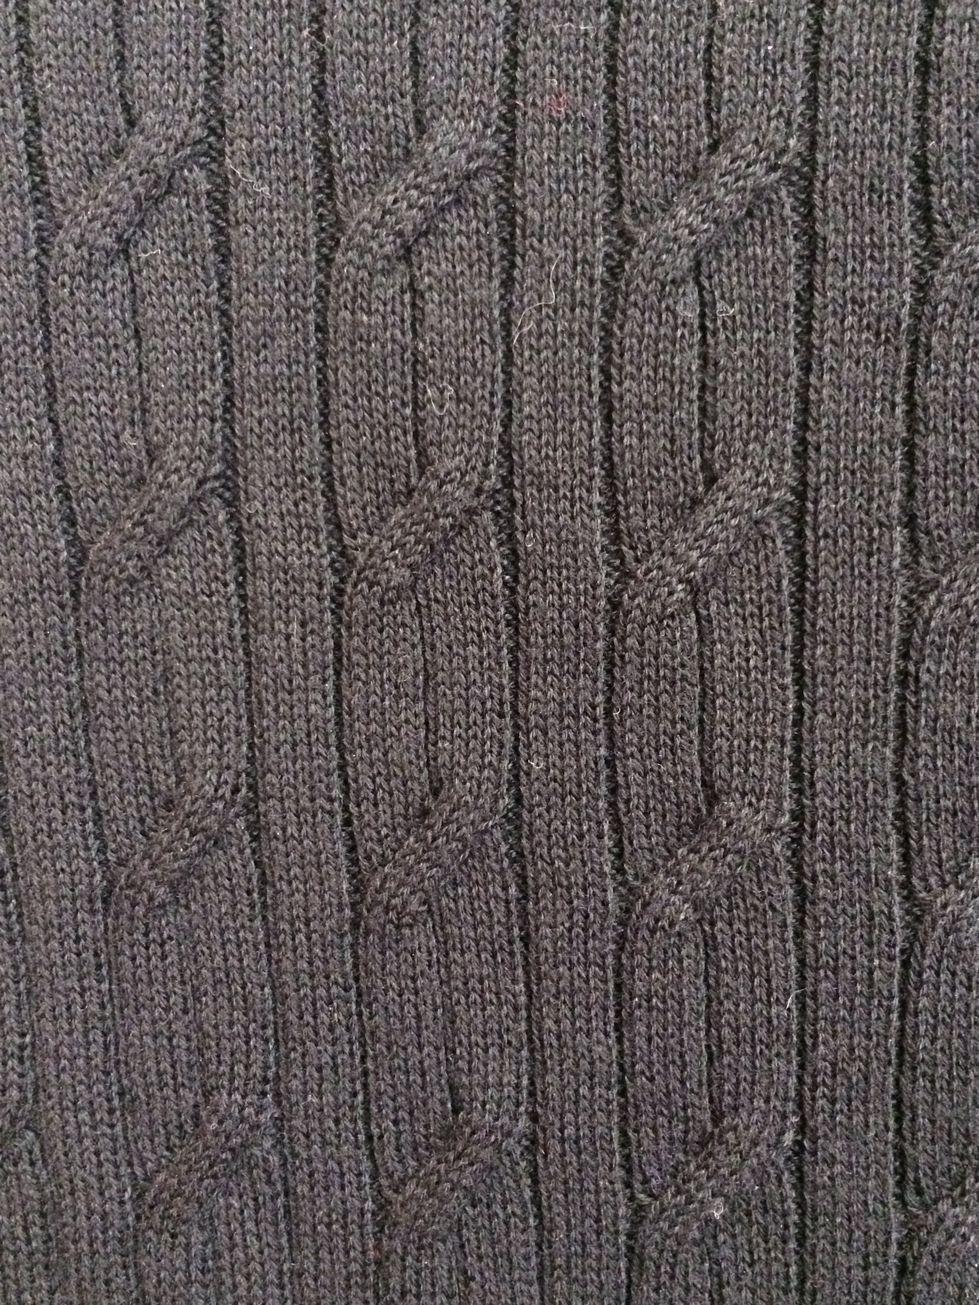 Talbots-Size-2X-Black-Pima-V-neck-Cable-Knit-Shirt_2991D.jpg